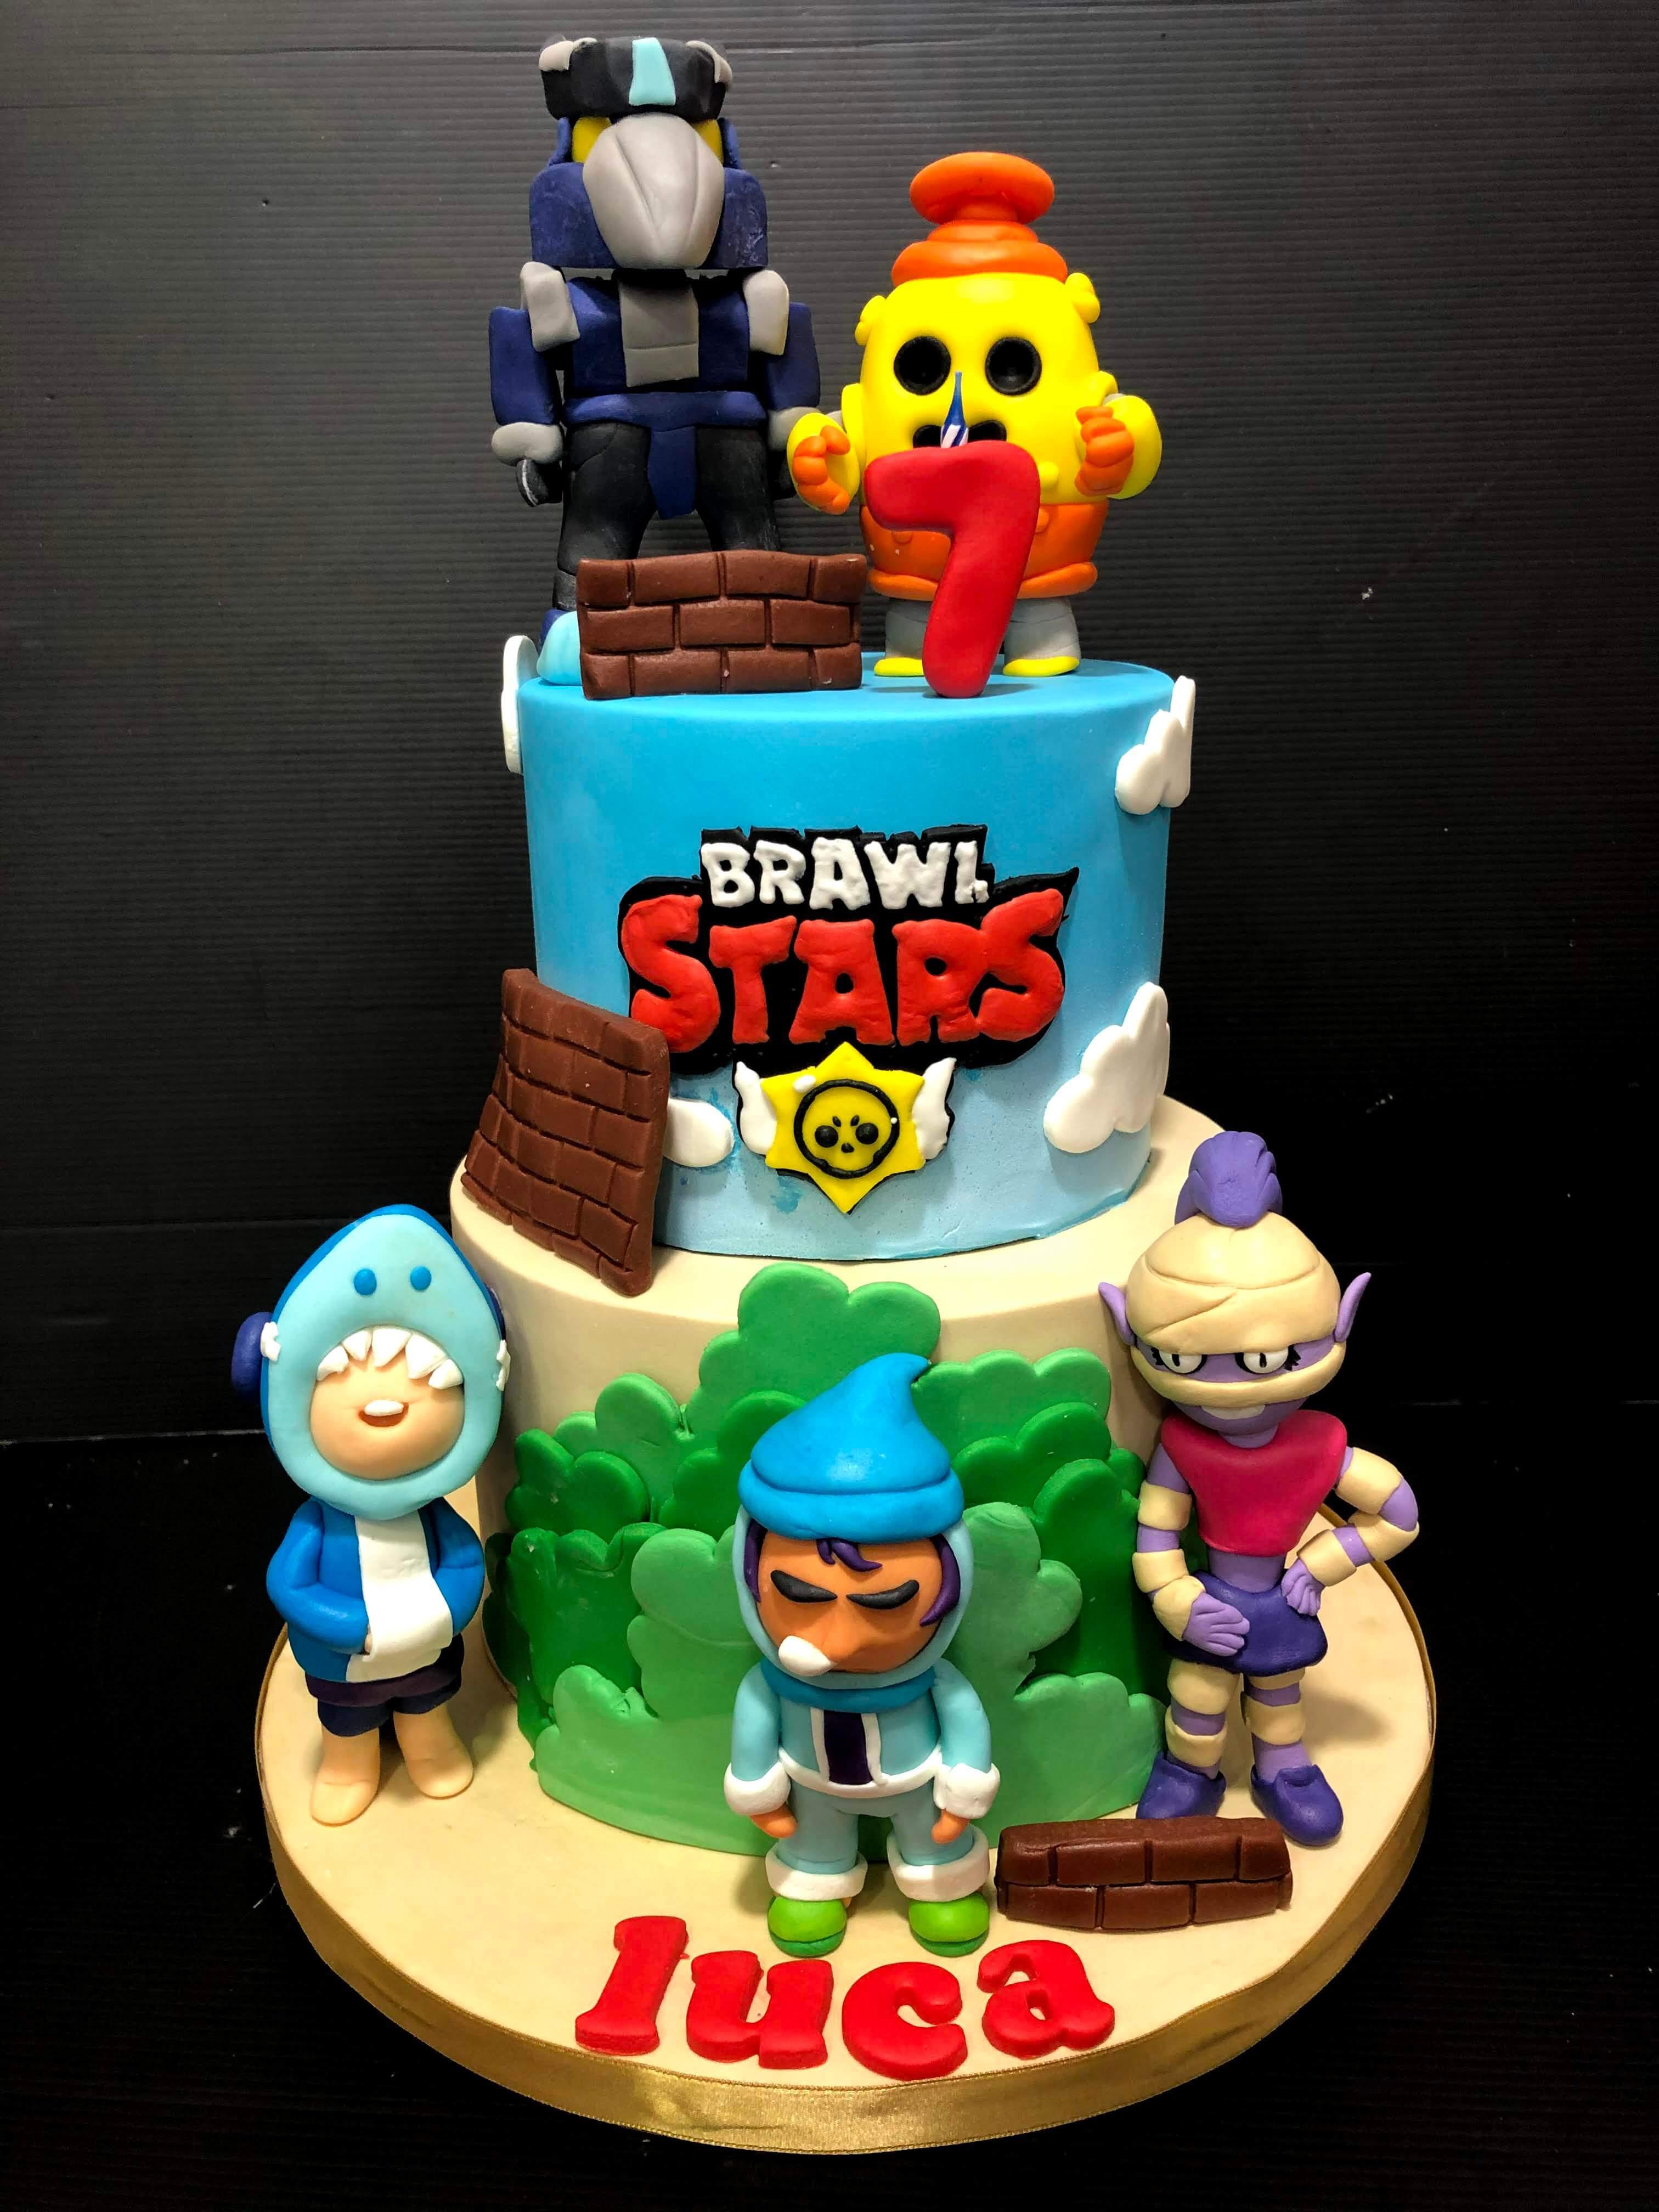 Tarta fondant cumpleaños personalizada Brawl Stars coruña